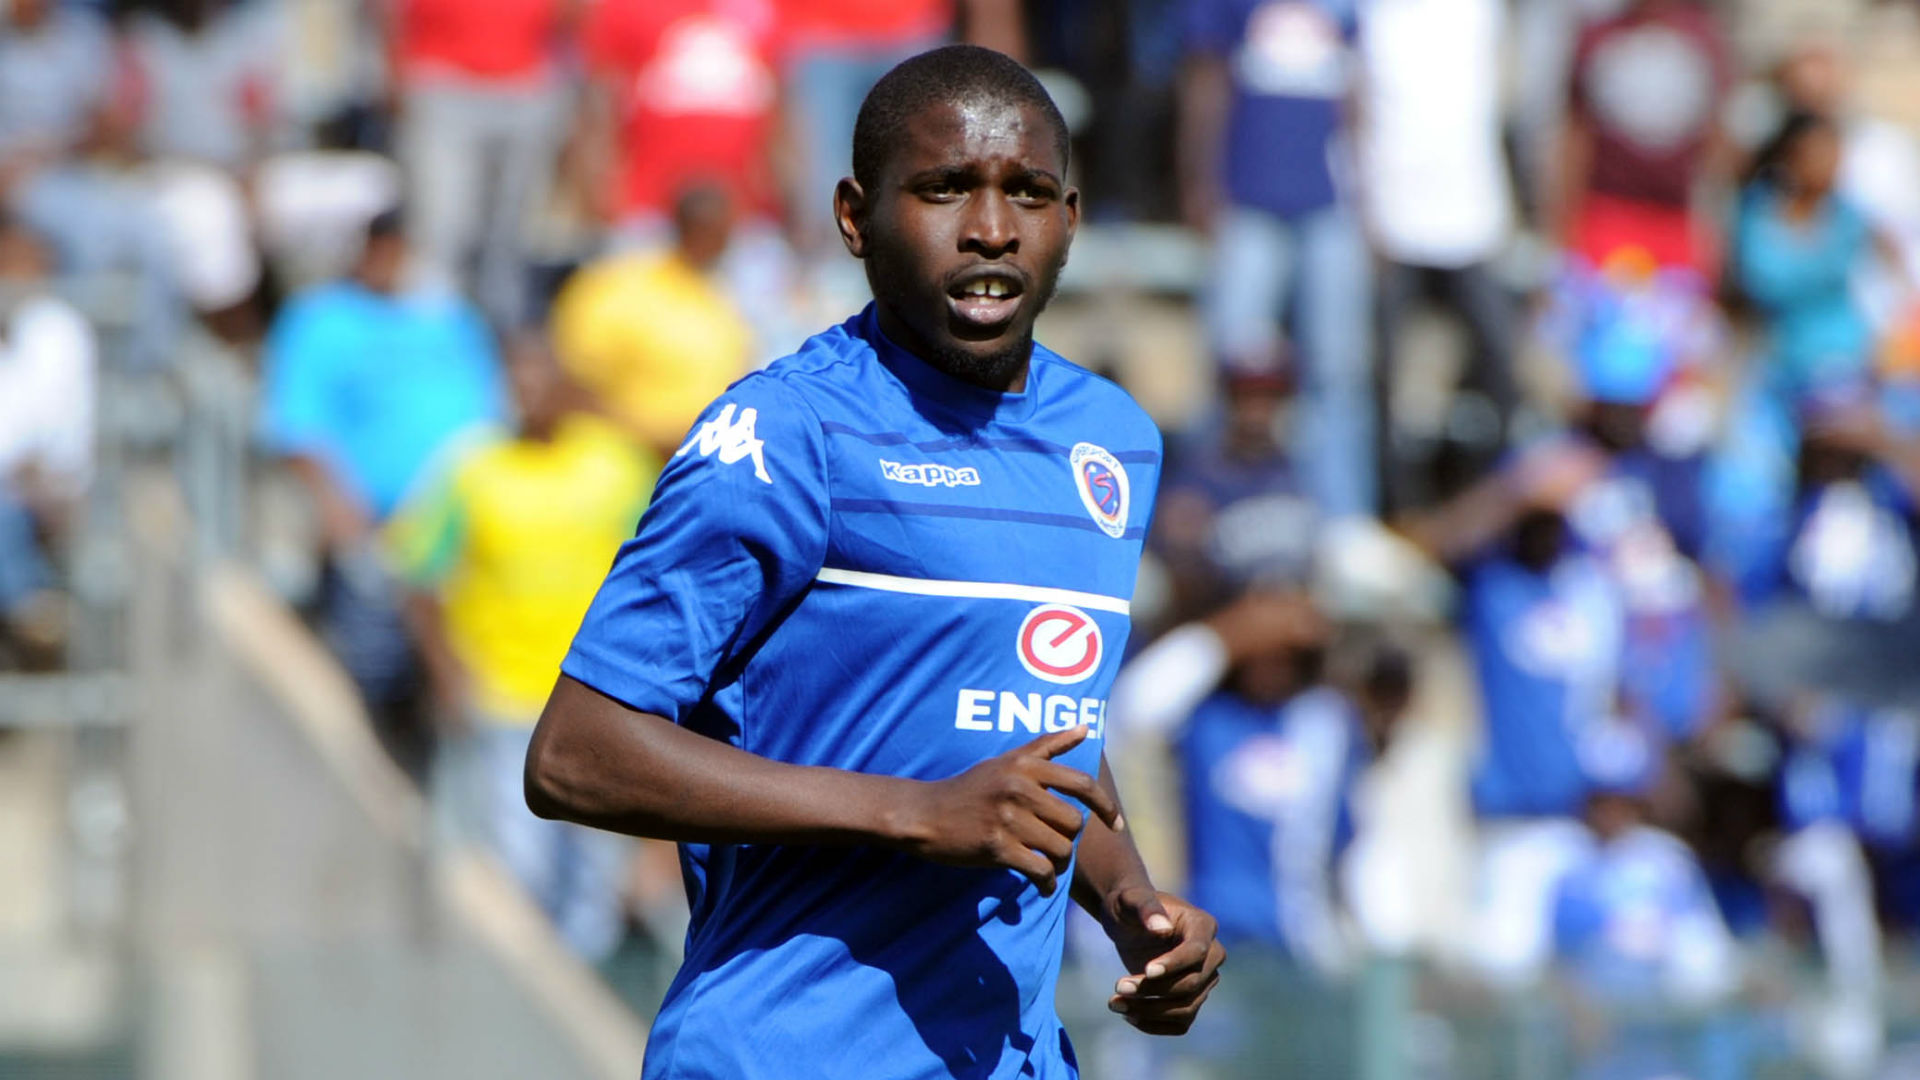 How Matthews convinced Modiba to choose SuperSport United over Mamelodi Sundowns